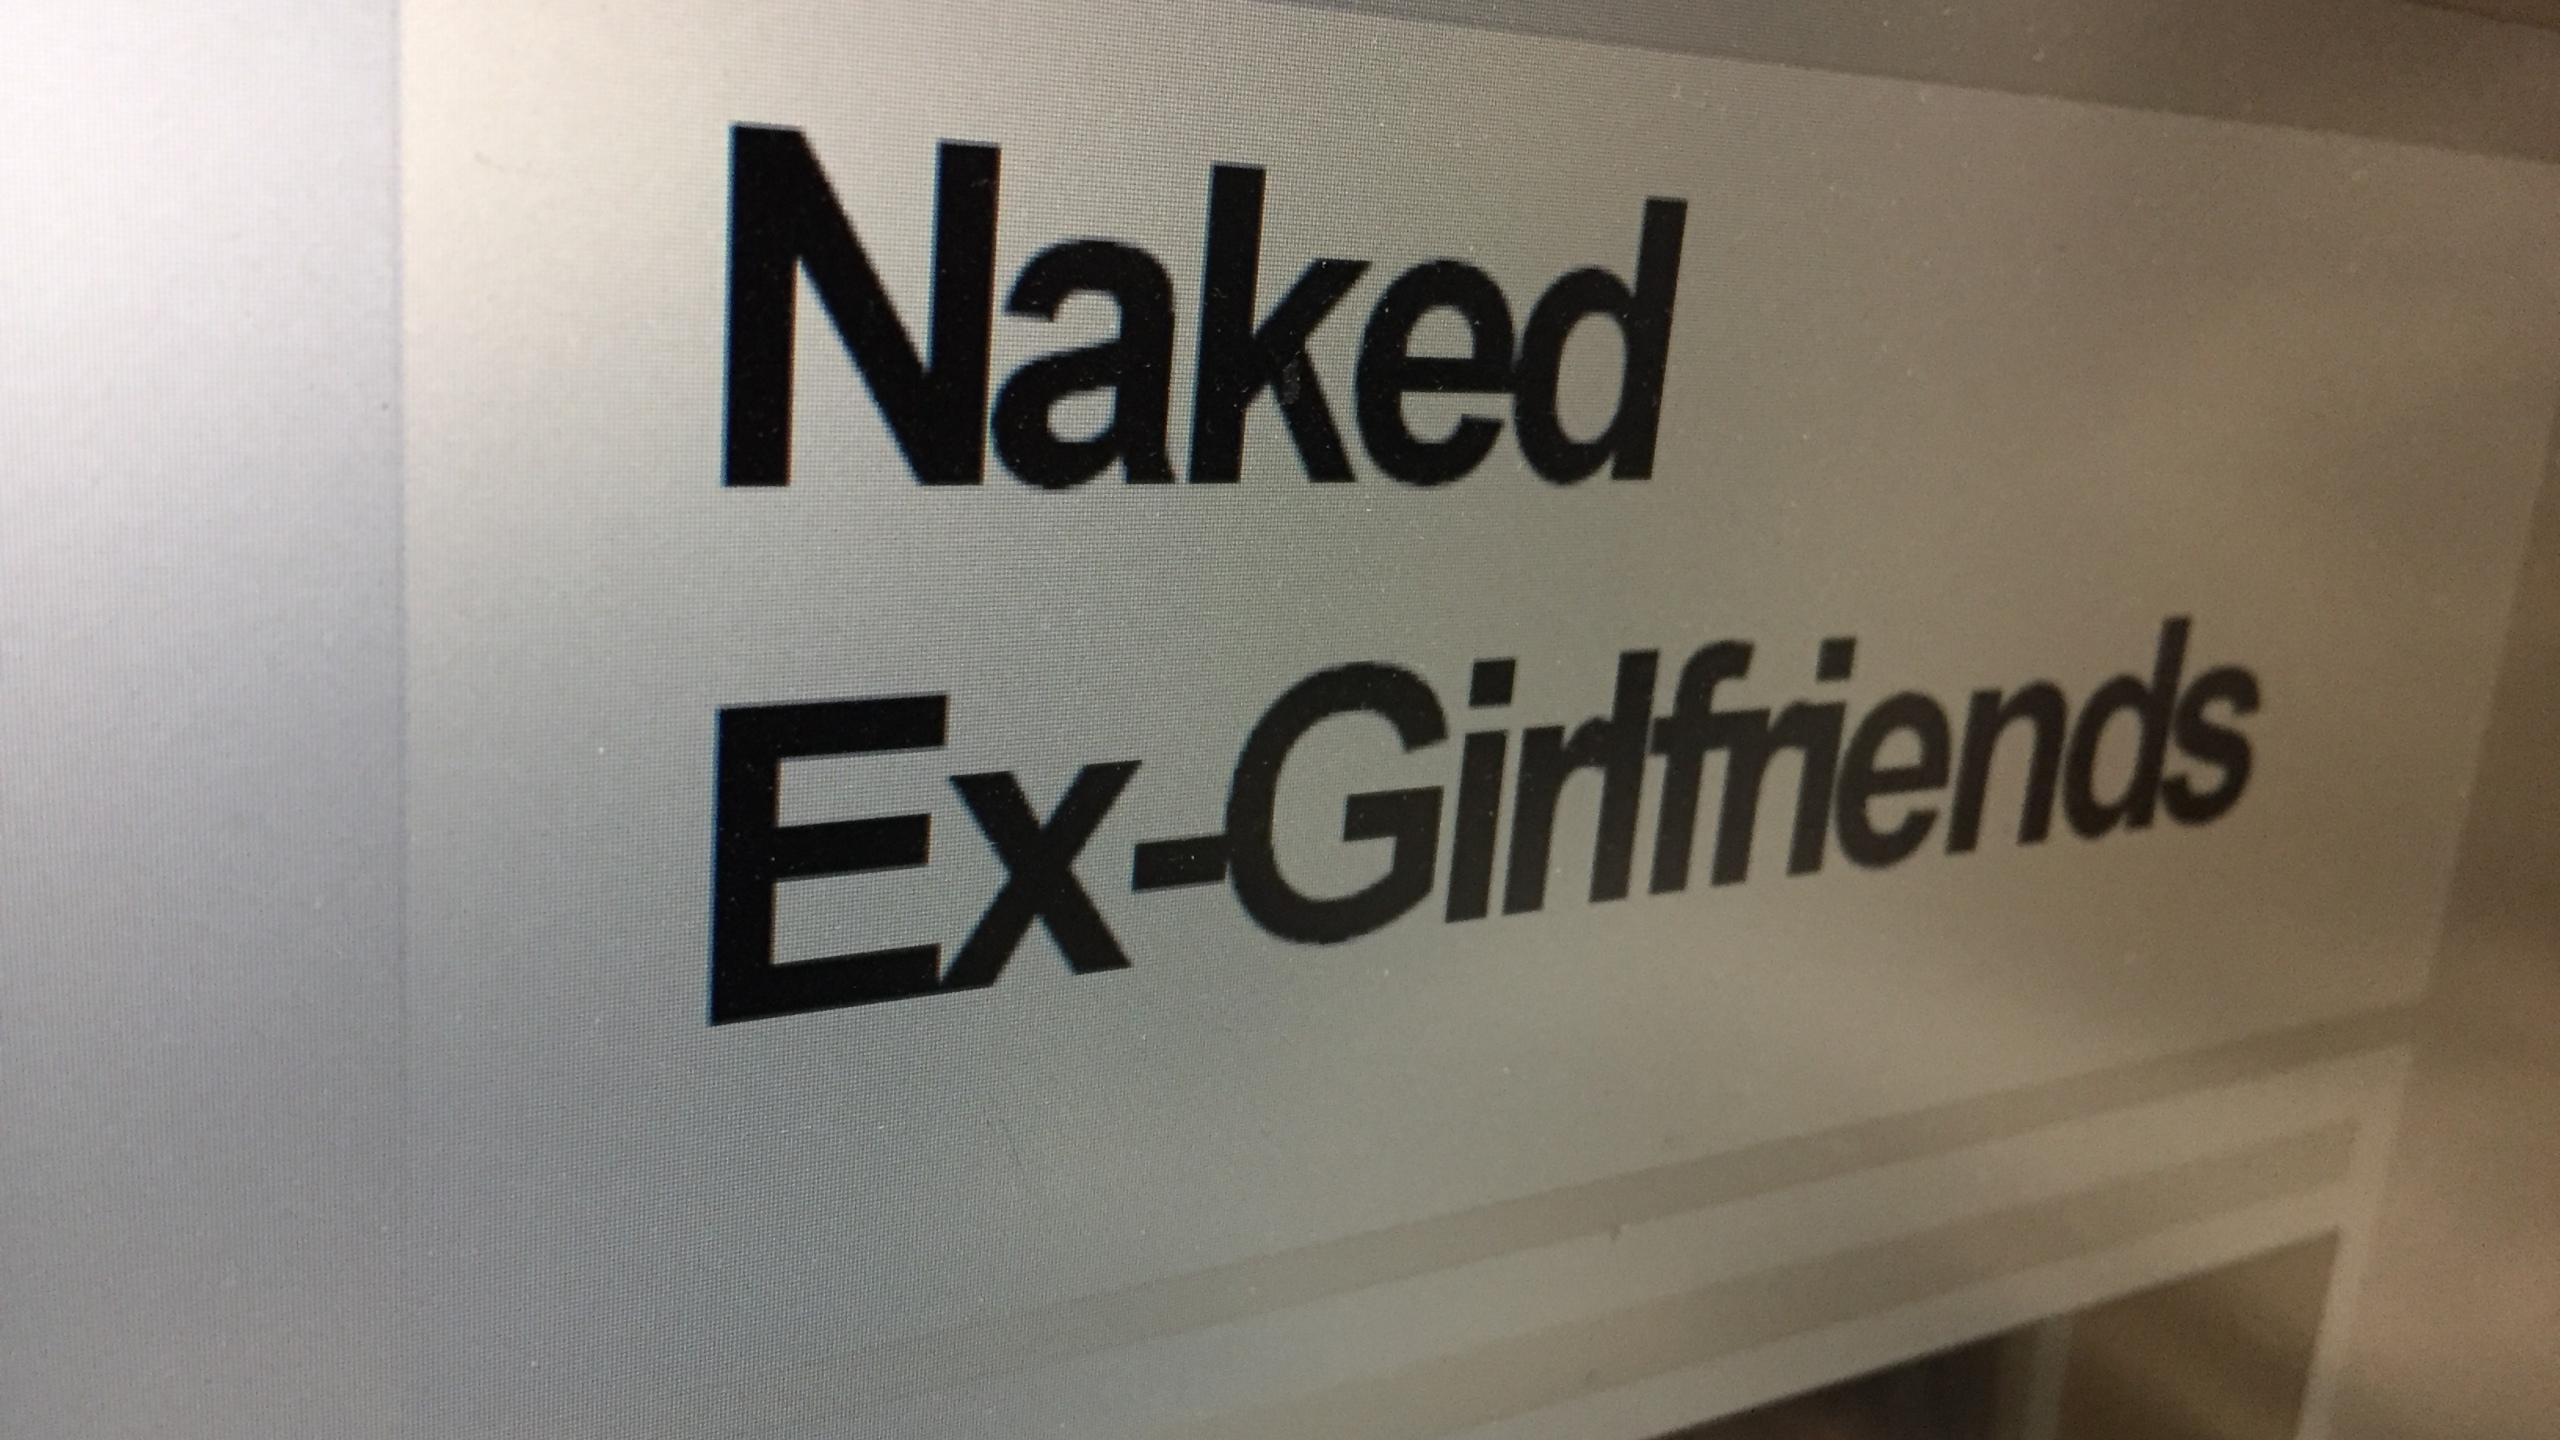 naked-ex-girlfriends-website_180934